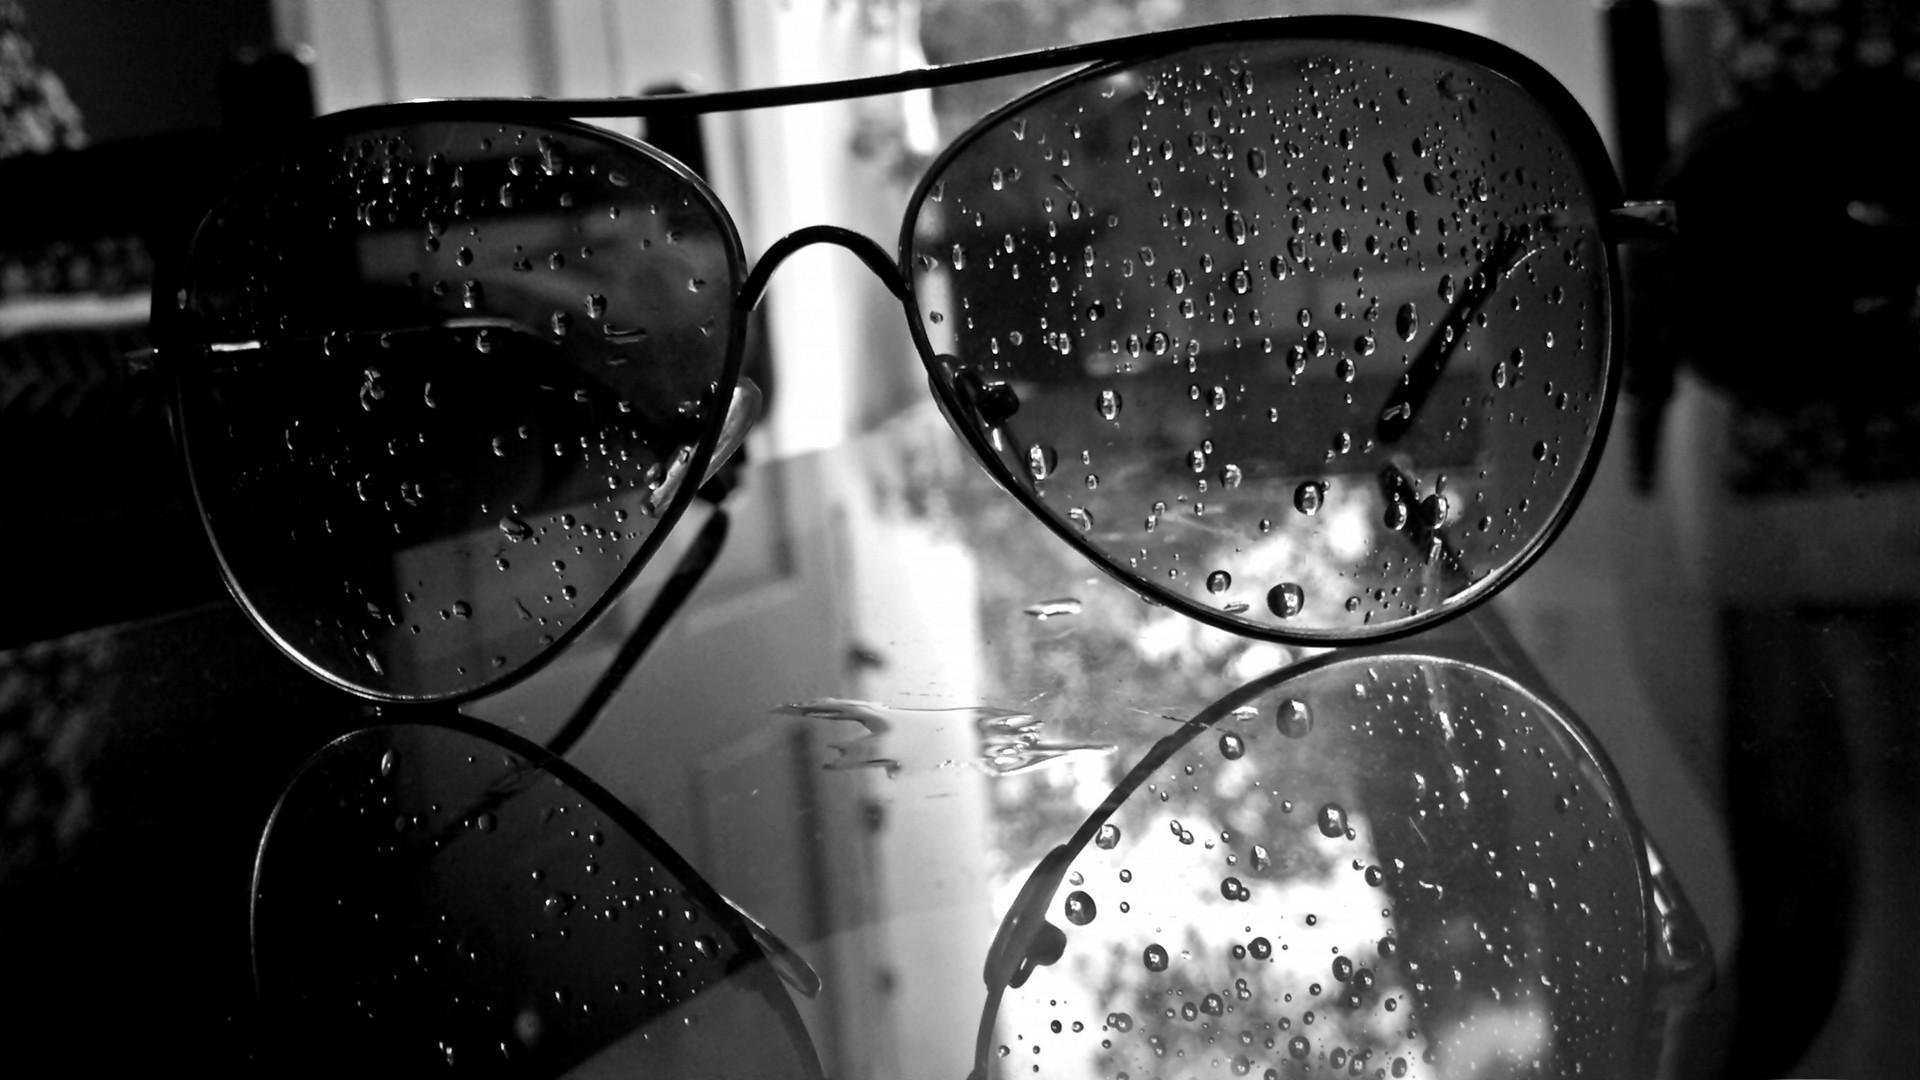 White black monochrome sunglasses glasses photography water drops glass light shape darkness black and white monochrome